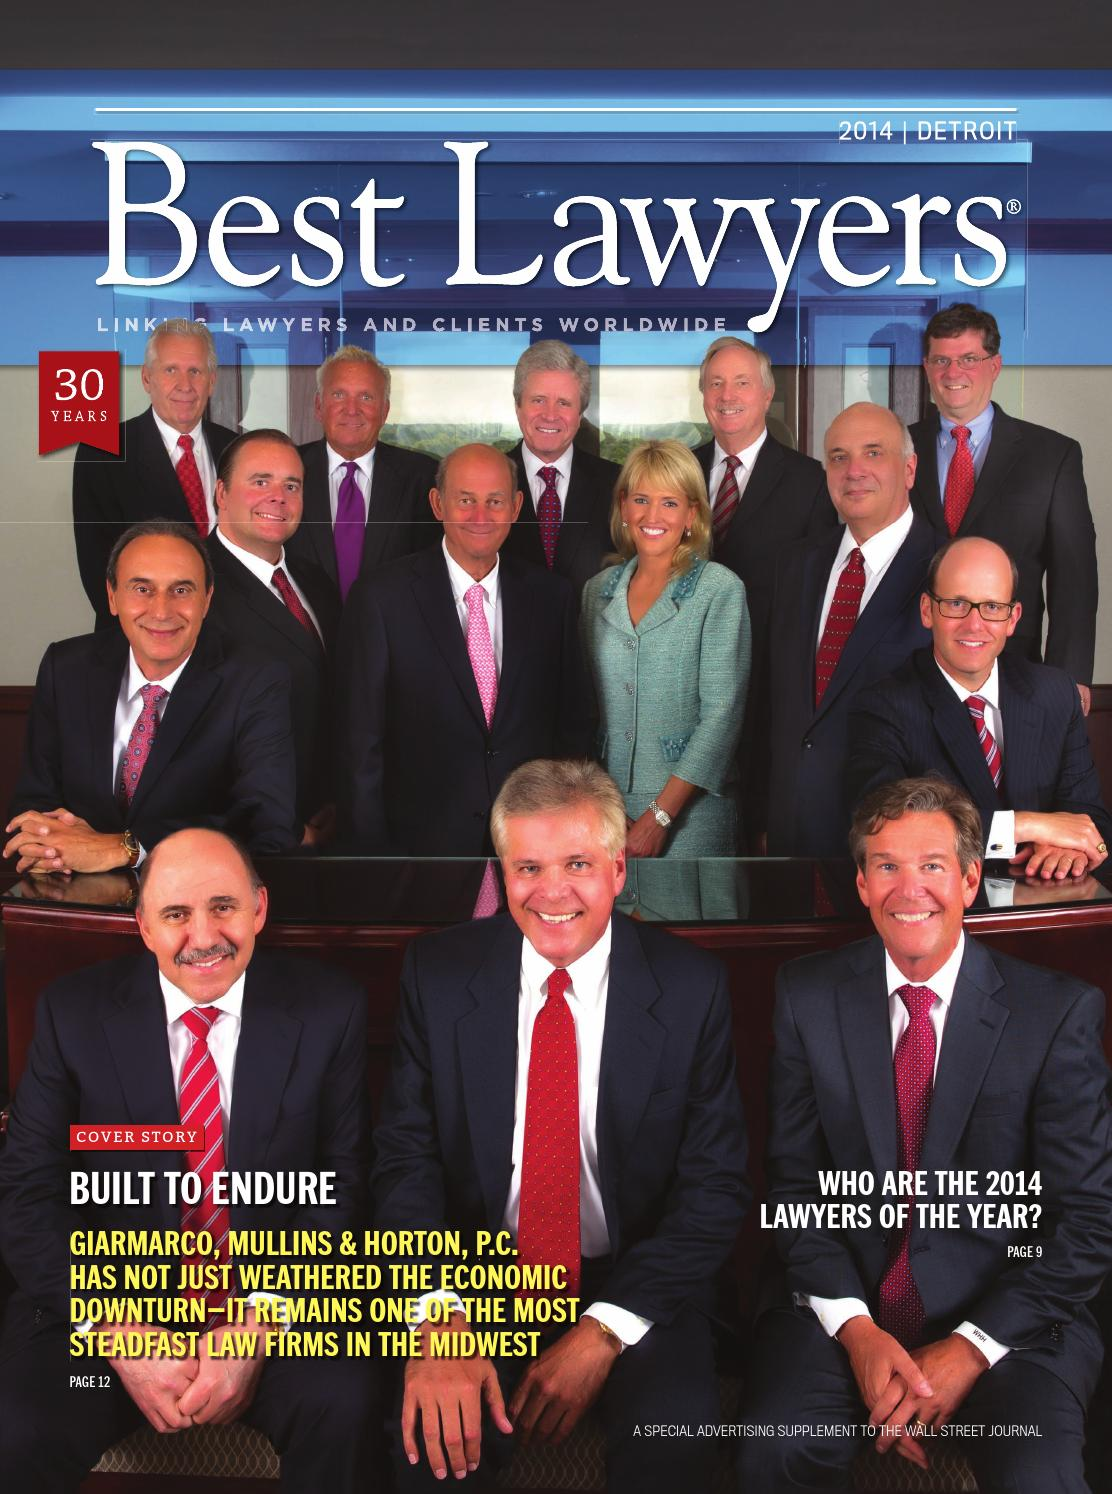 best lawyers in detroit 2014 by best lawyers issuu